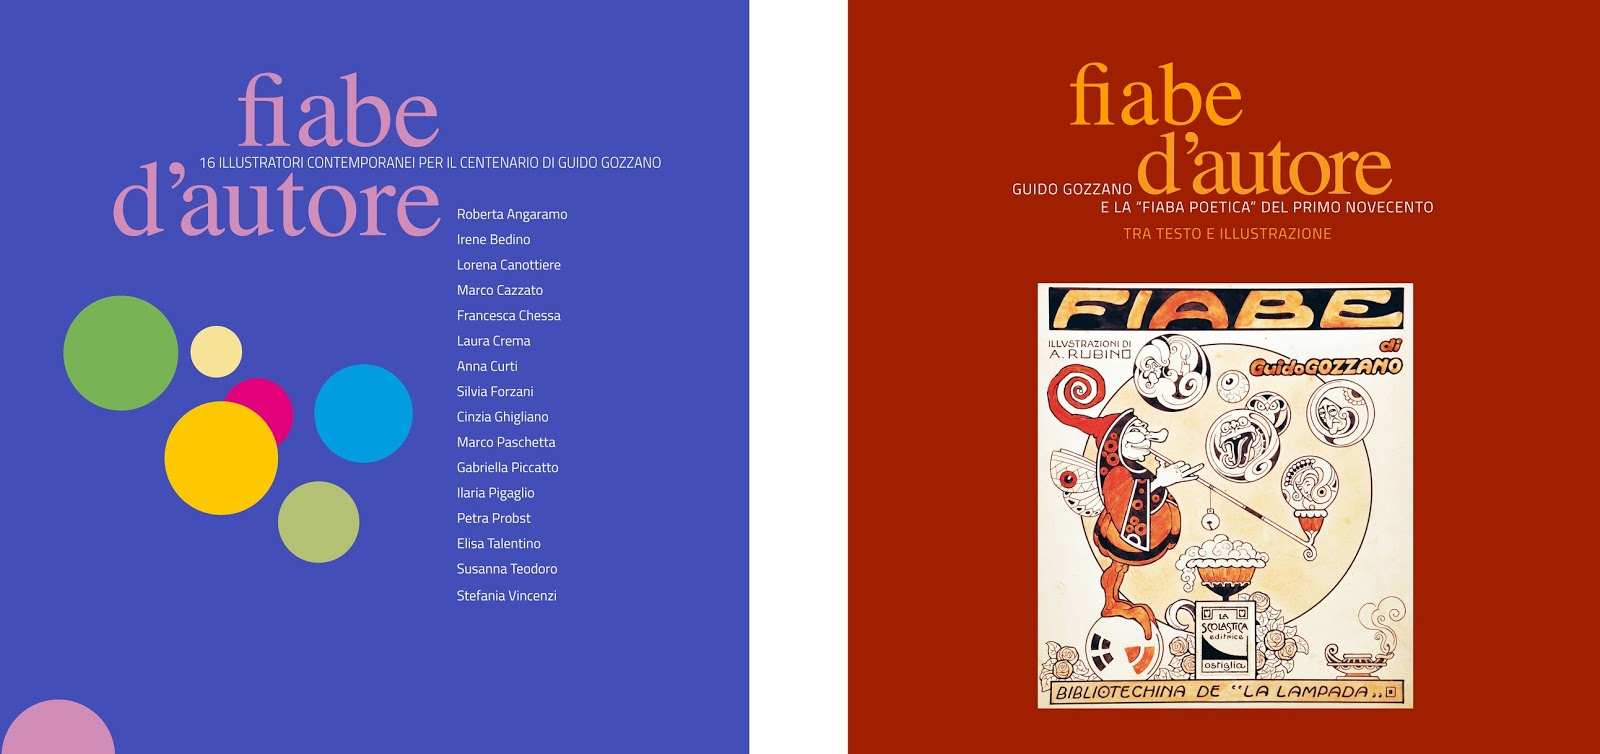 francesca forzani dissertation